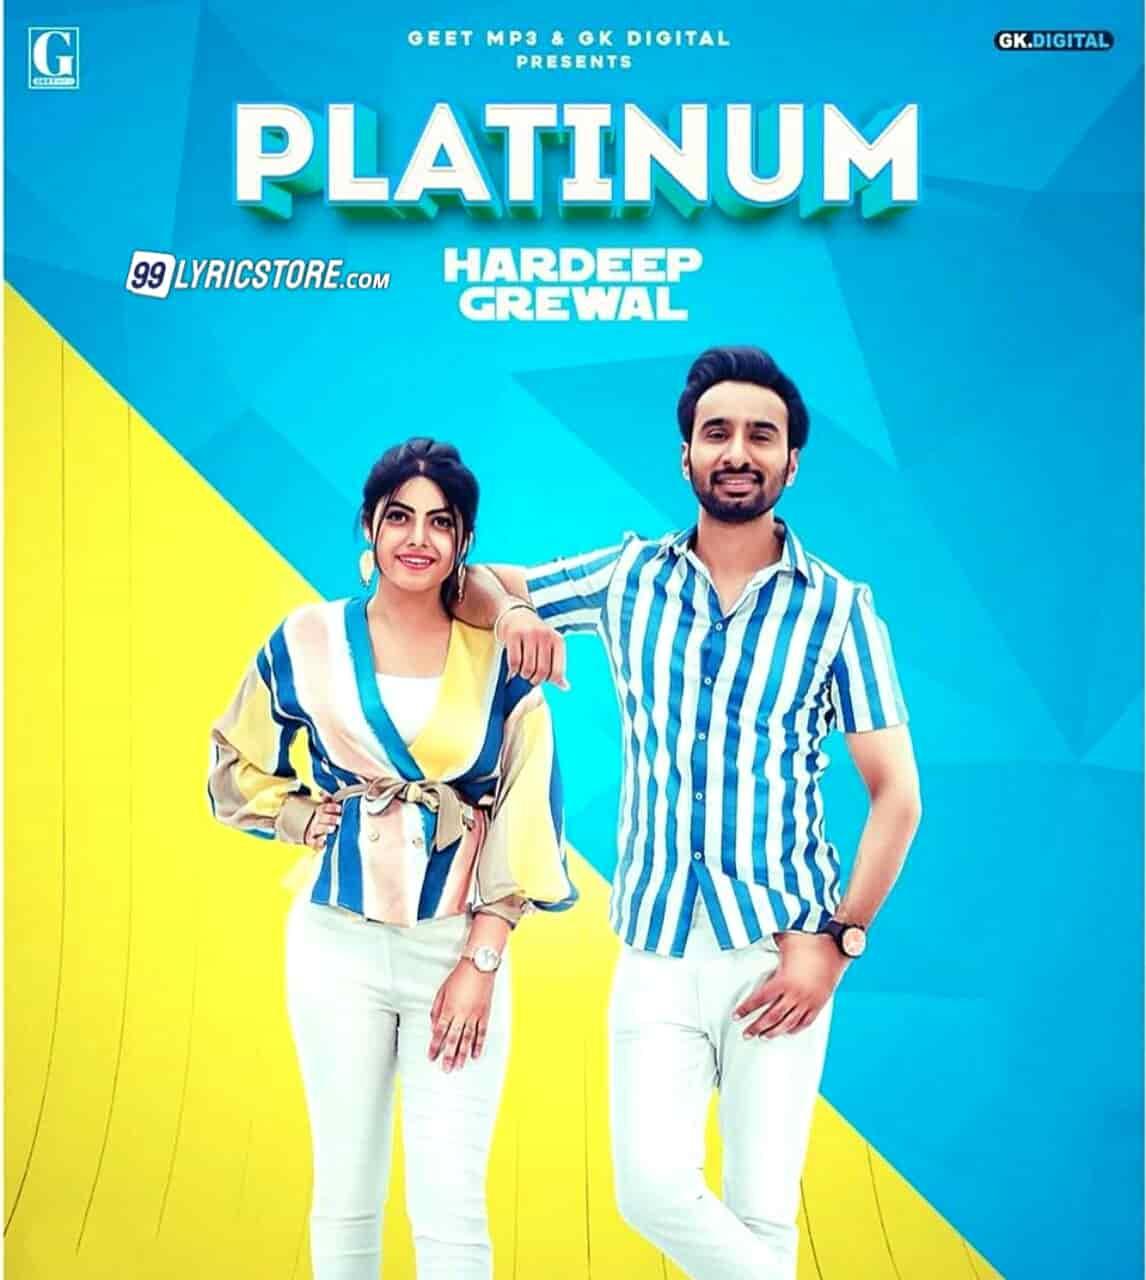 Platinum punjabi song lyrics sung by Hardeep Grewal and Gulrez Akhtar